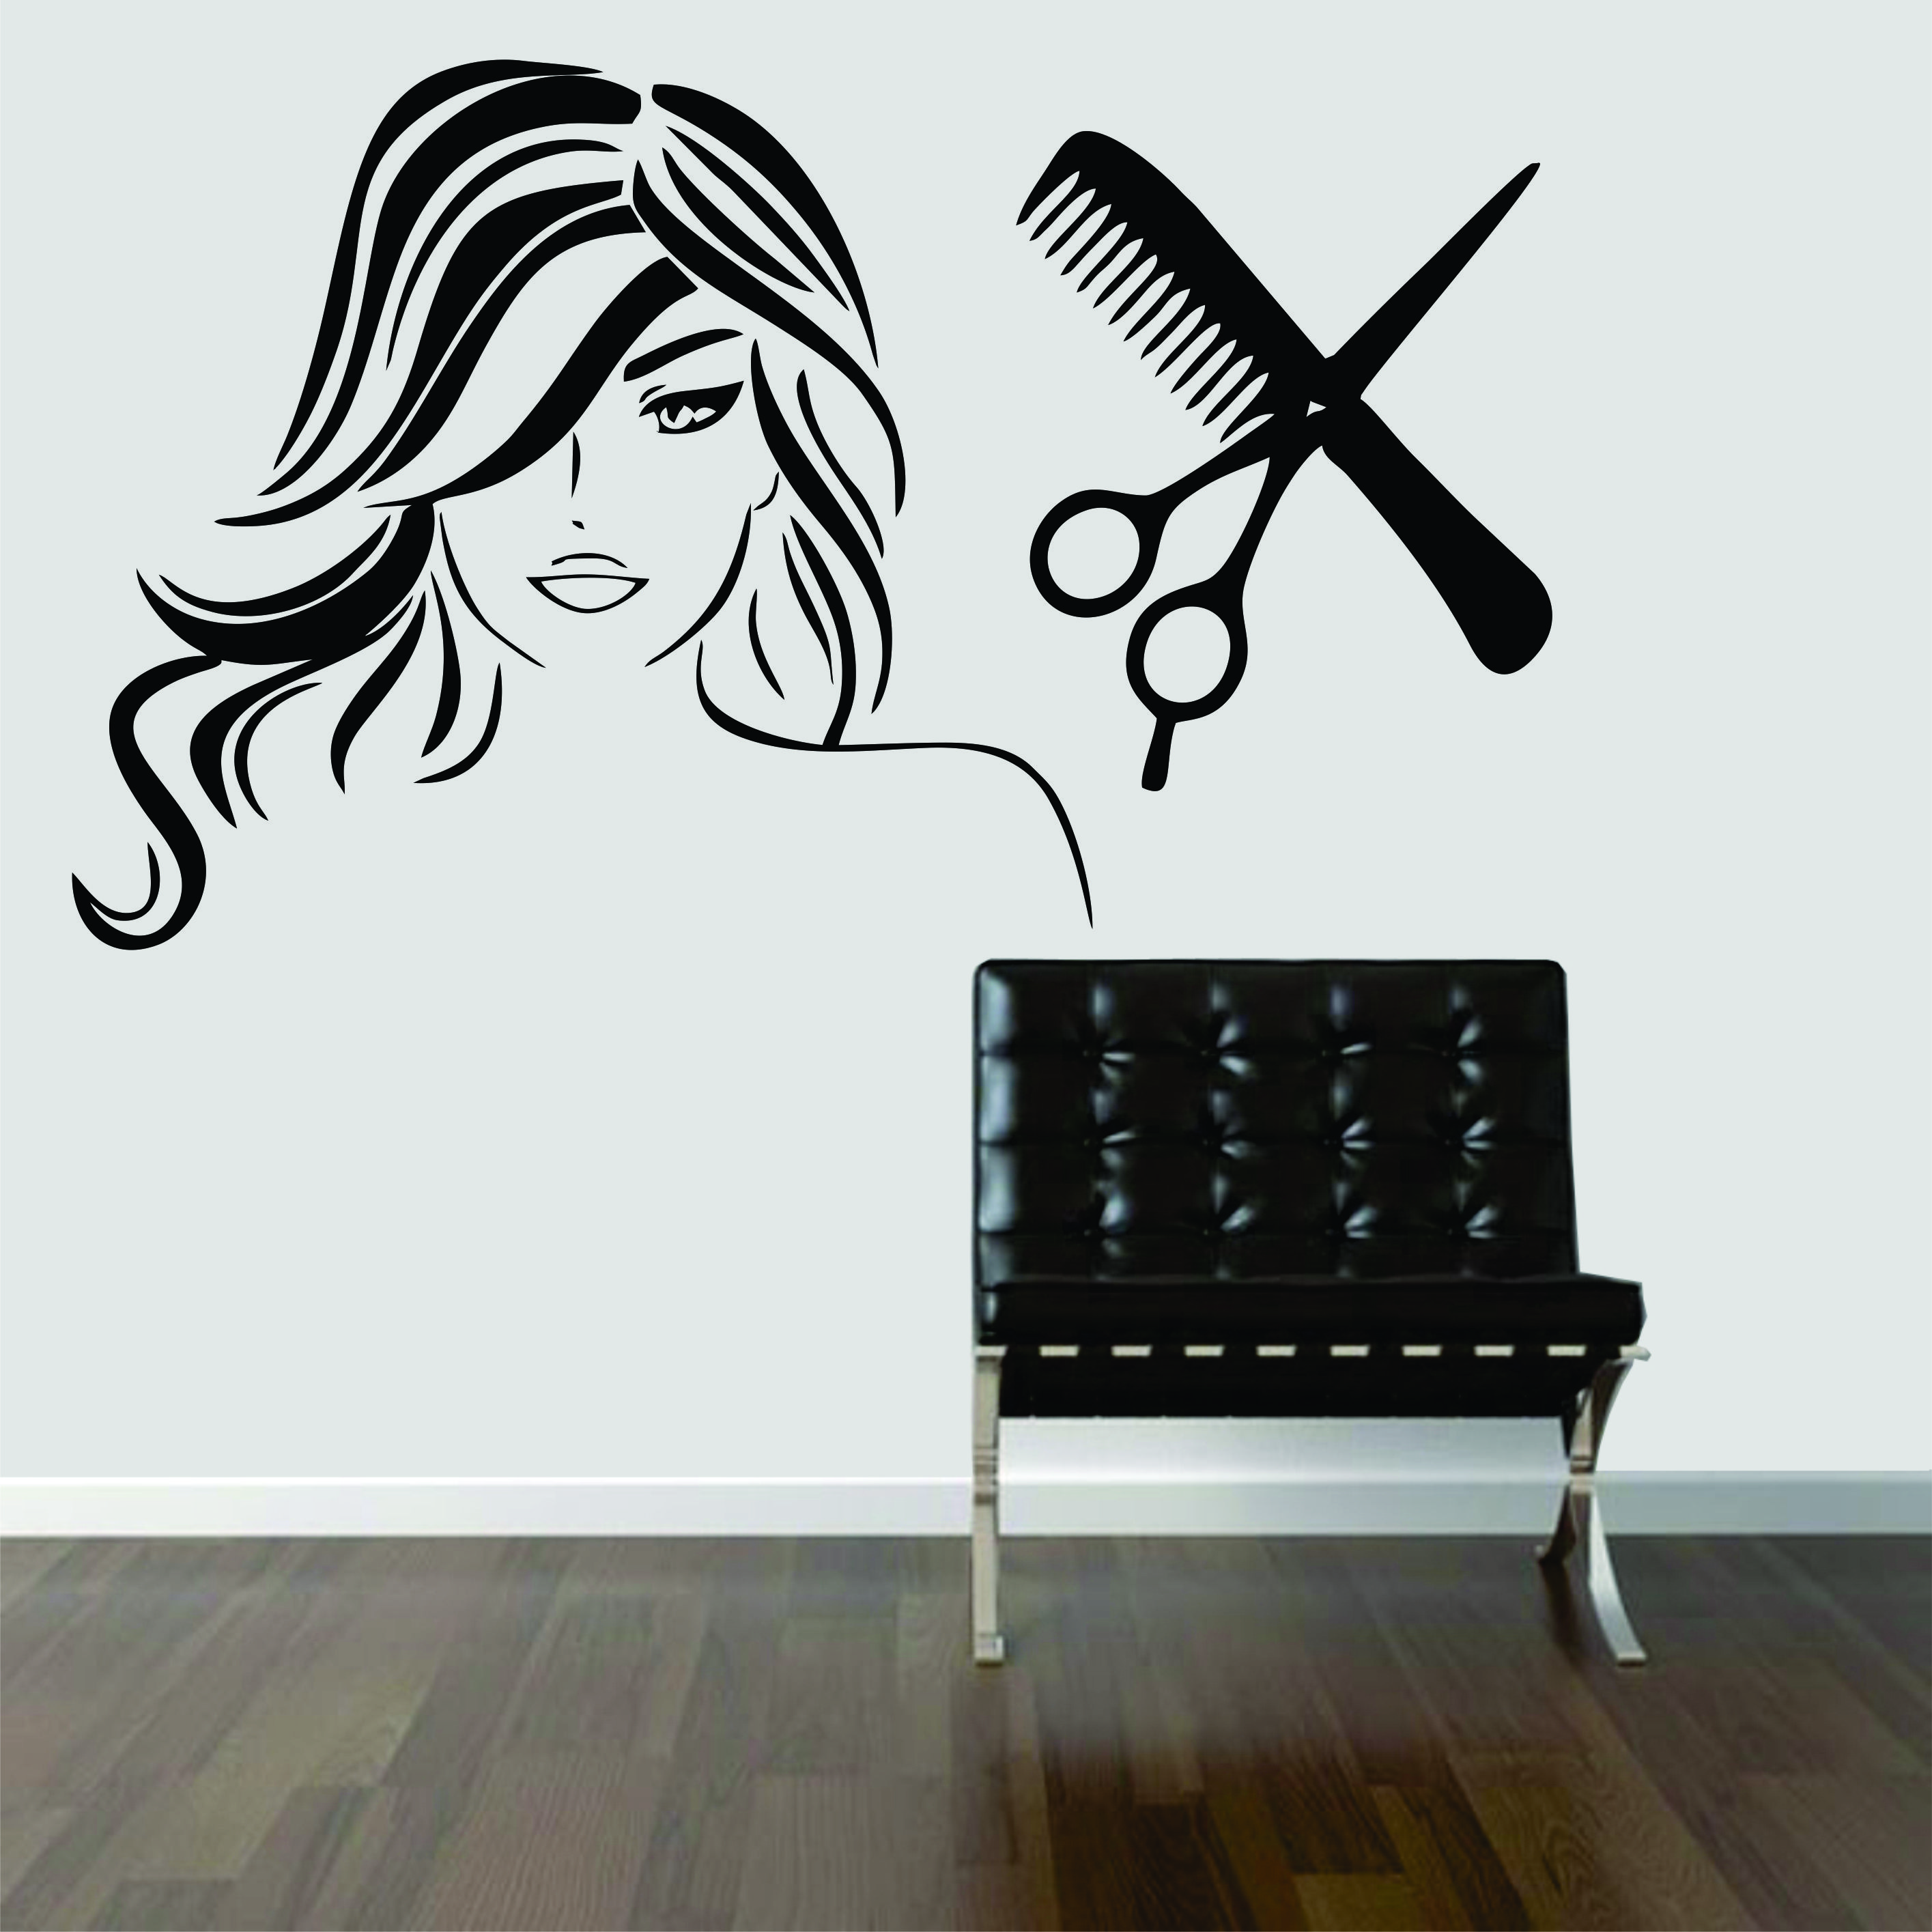 adesivo-parede-salao-beleza-cabelos-manicure.jpg